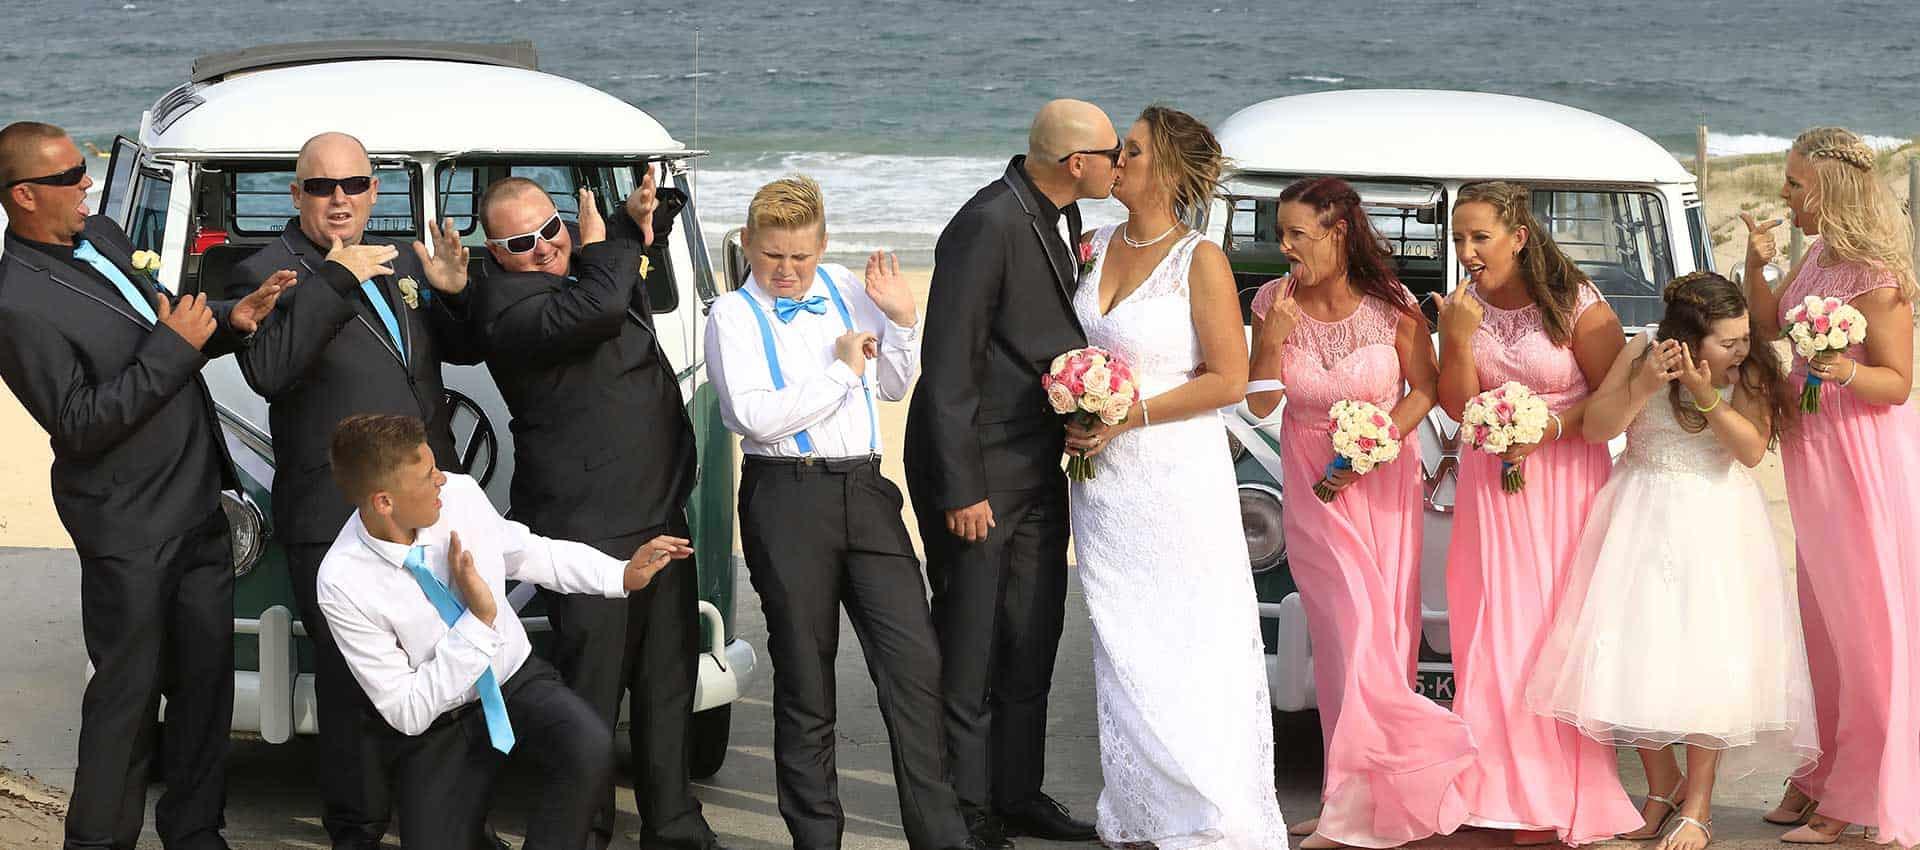 Best Wedding Photography Sydney